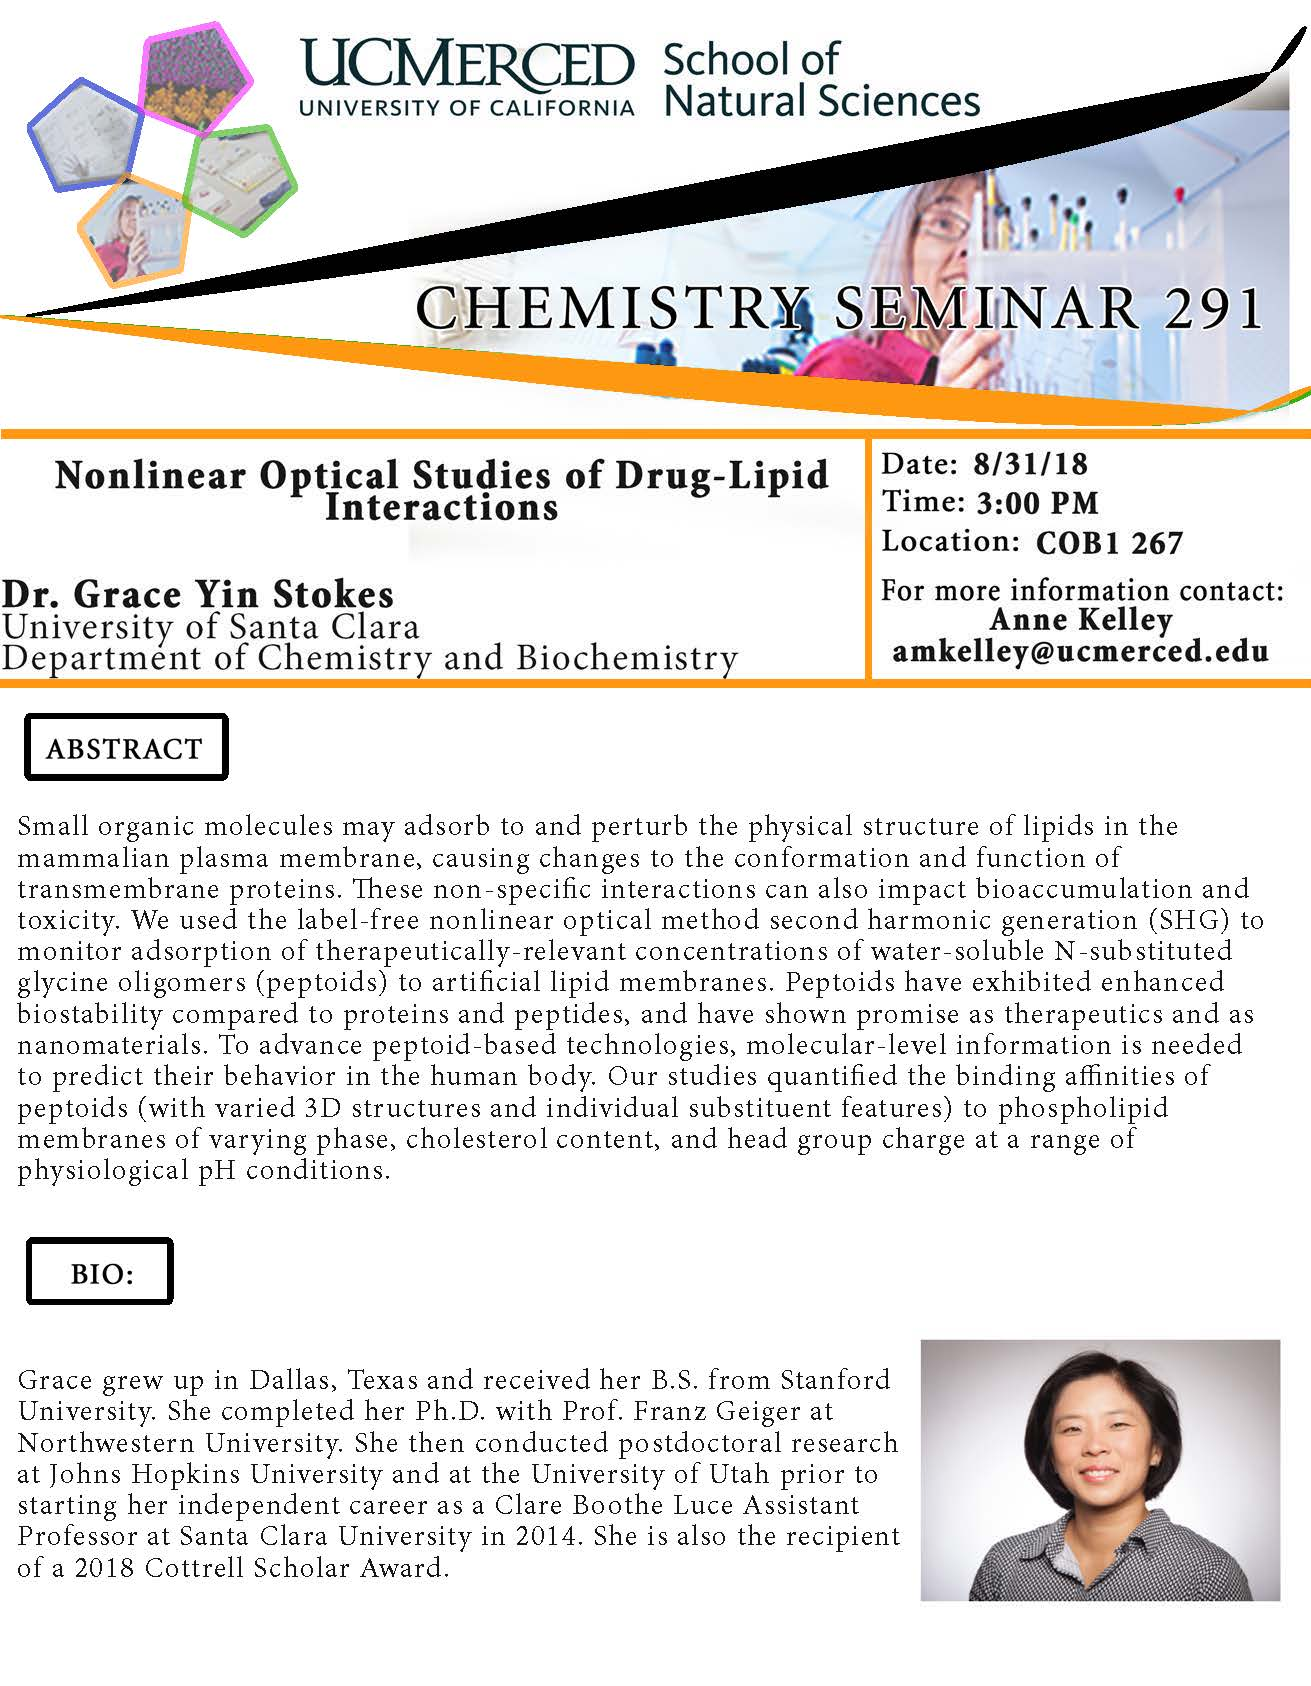 Chemistry Seminar Series 291 (8/31/18)